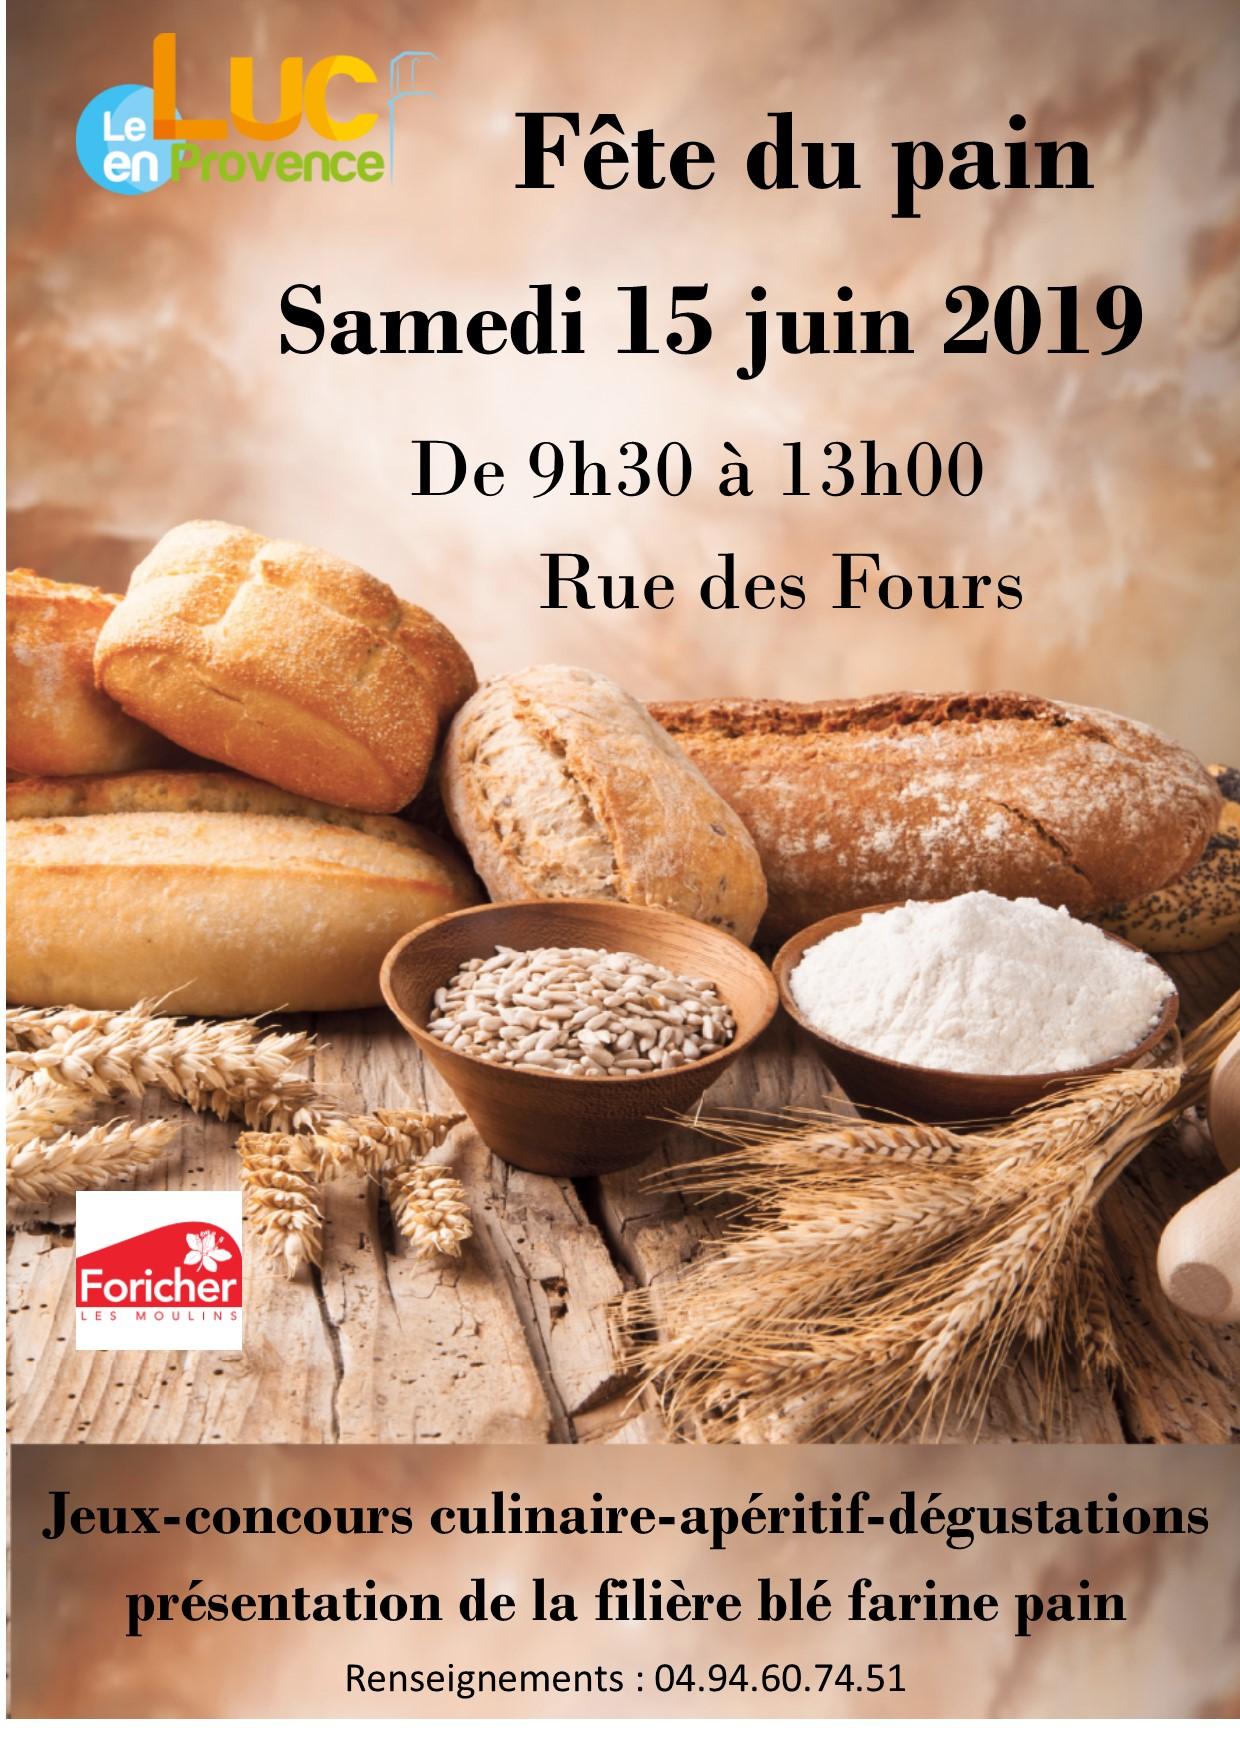 Samedi 15 juin, Fête du pain